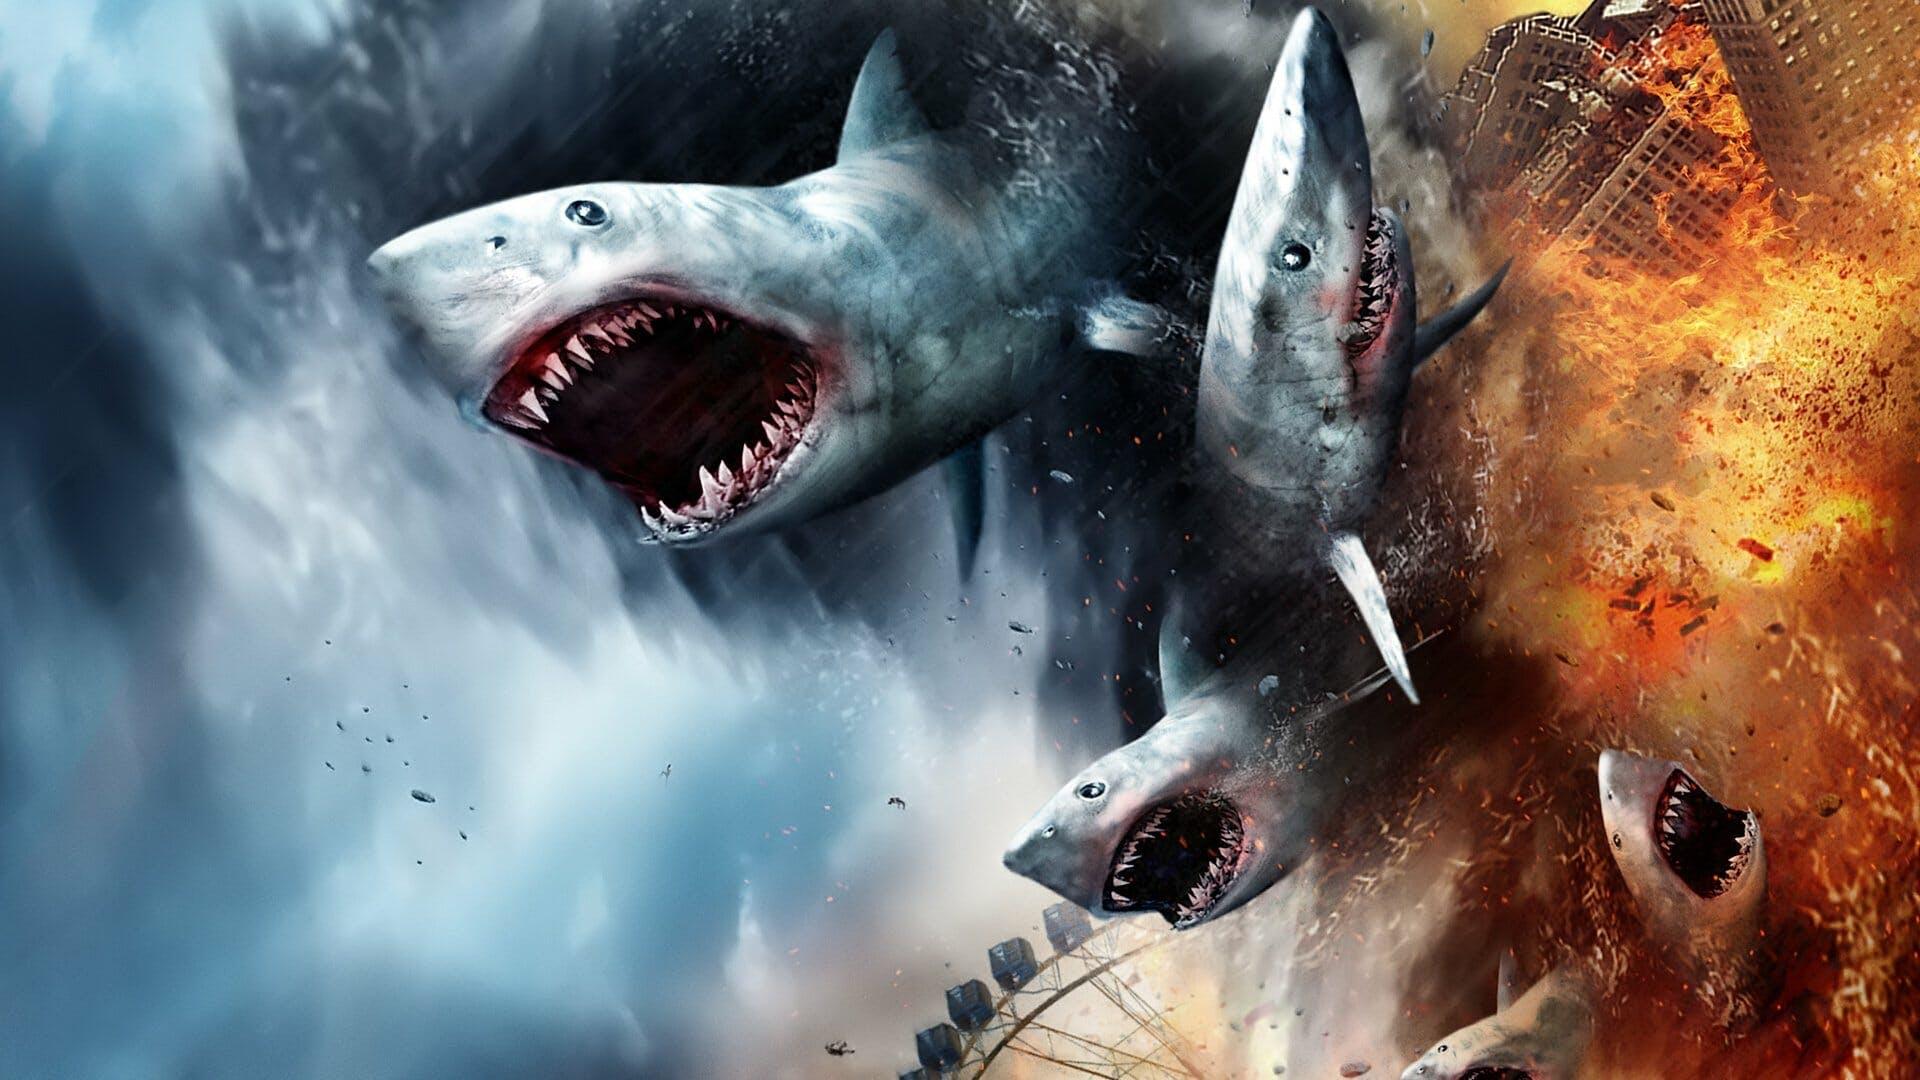 best comedy movies on netflix : Sharknado